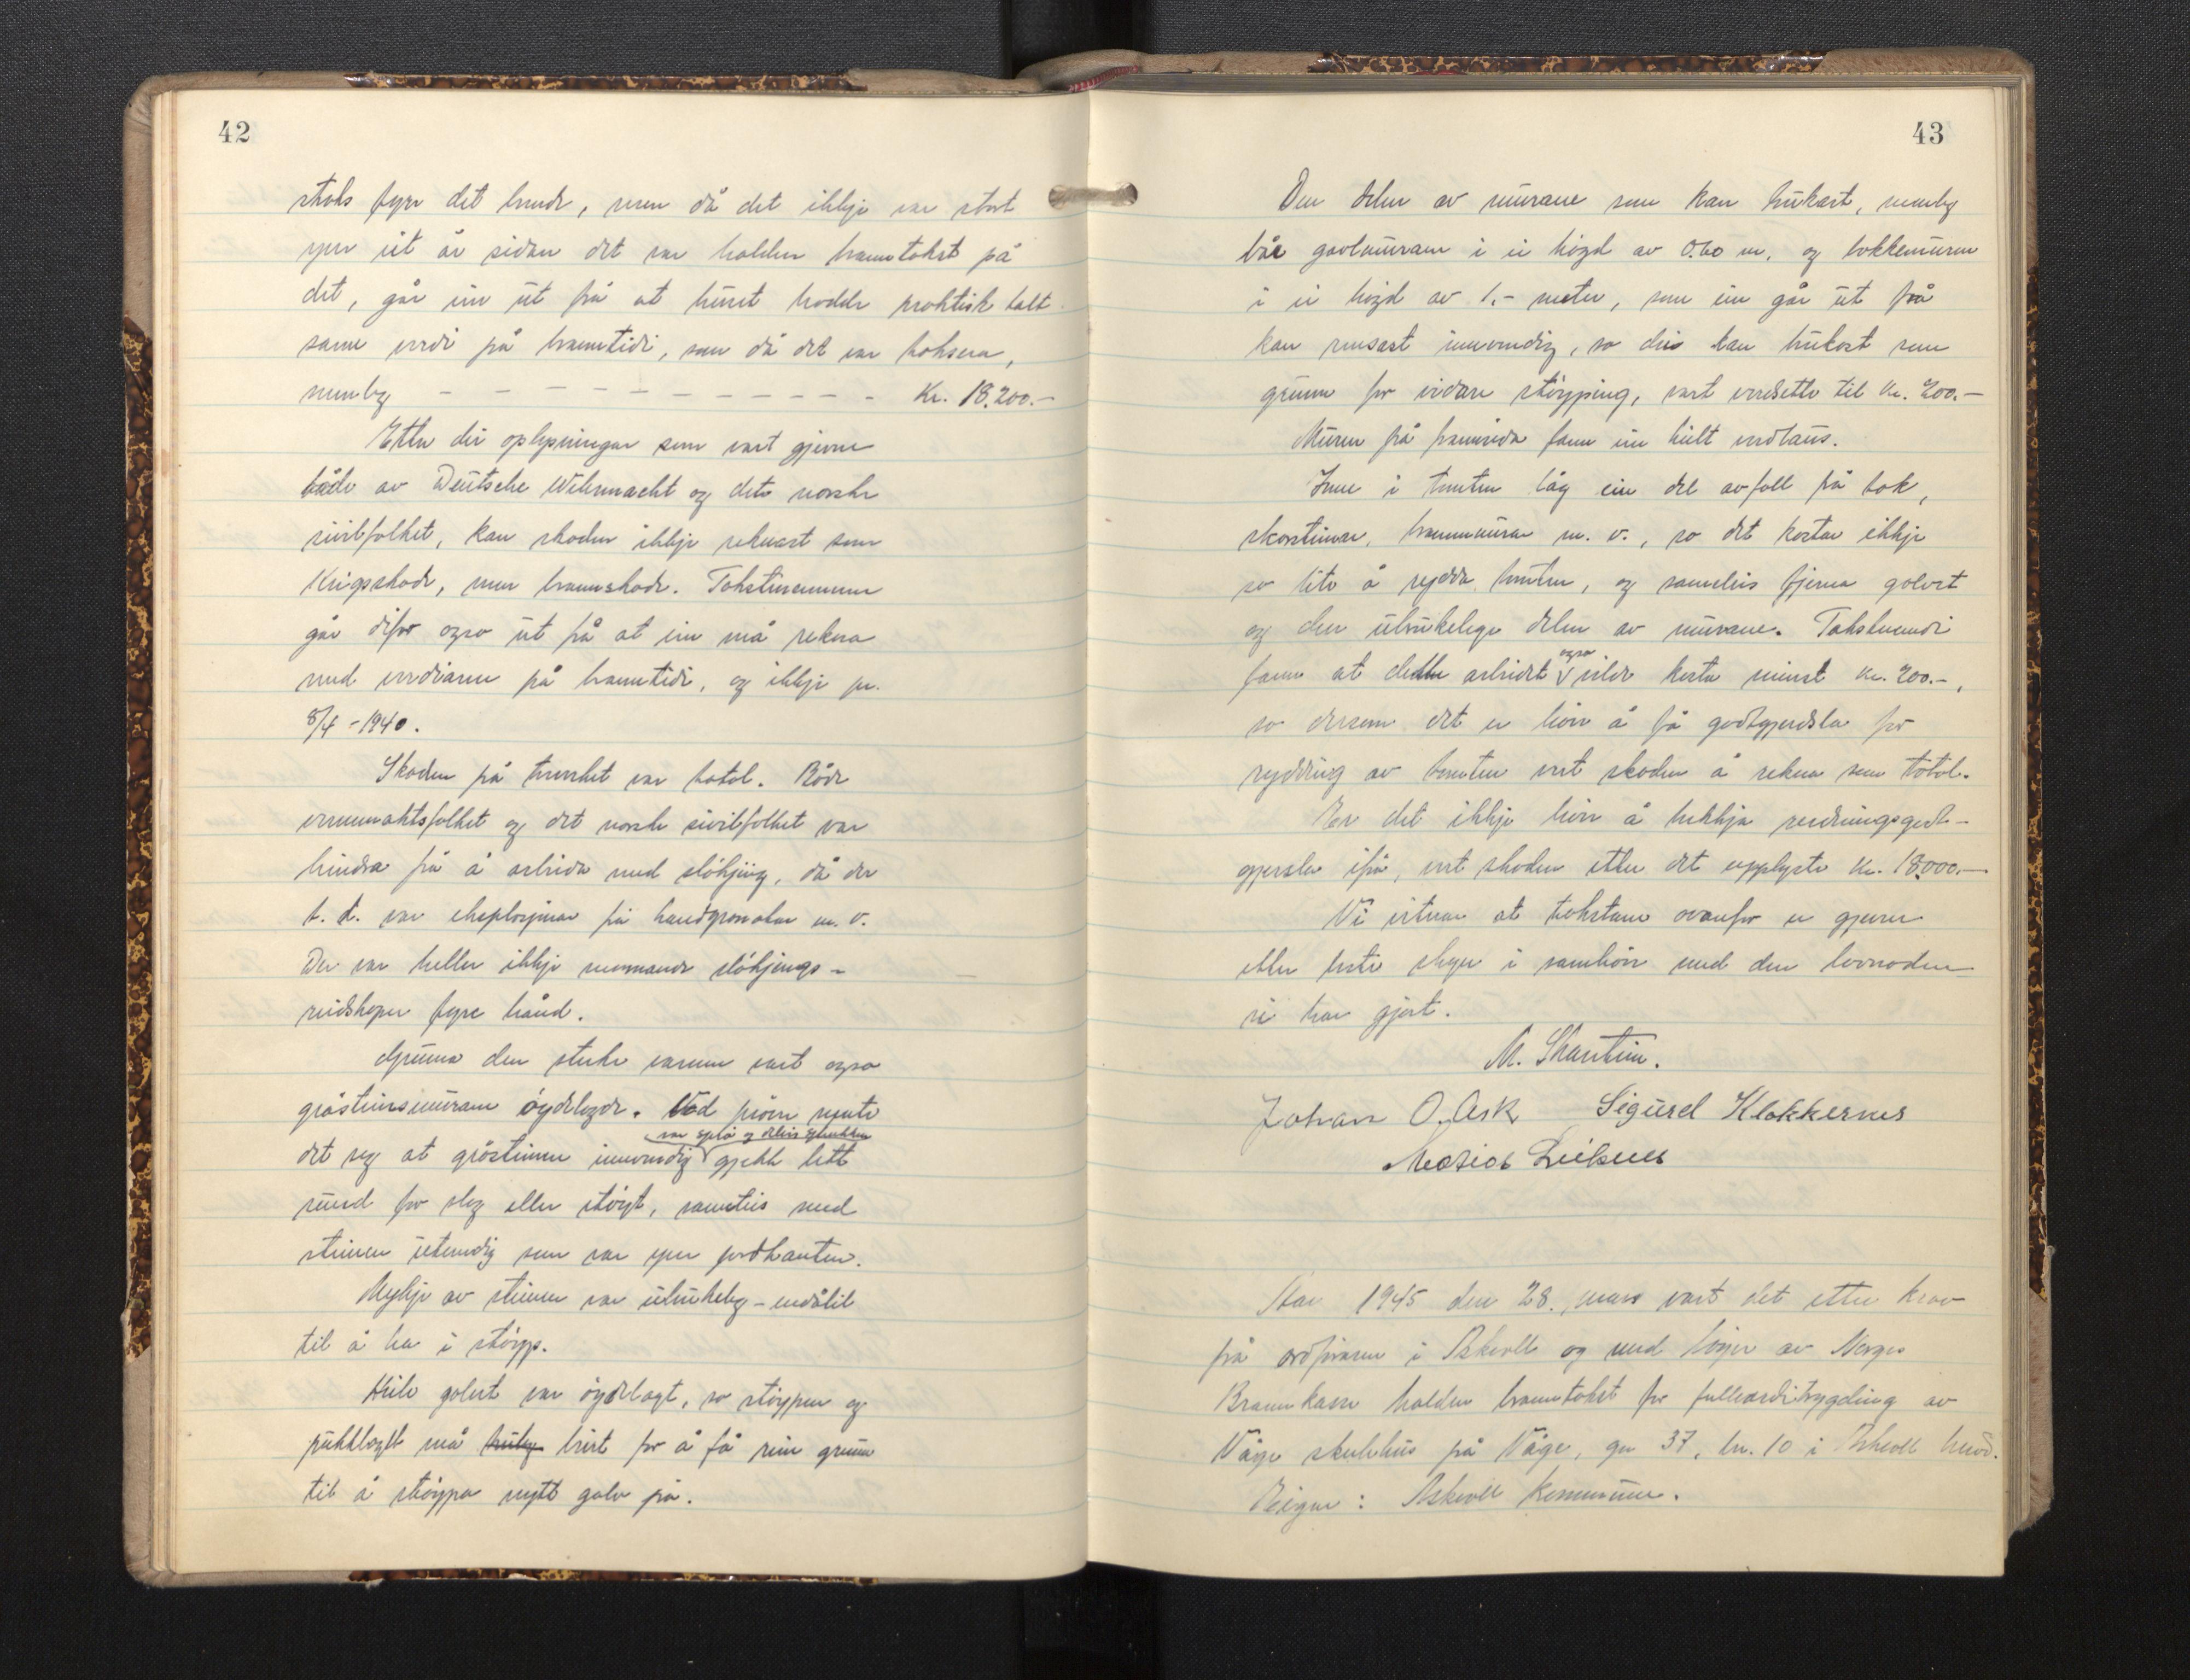 SAB, Lensmannen i Askvoll, 0012/L0002: Branntakstprotokoll, 1942-1952, s. 42-43